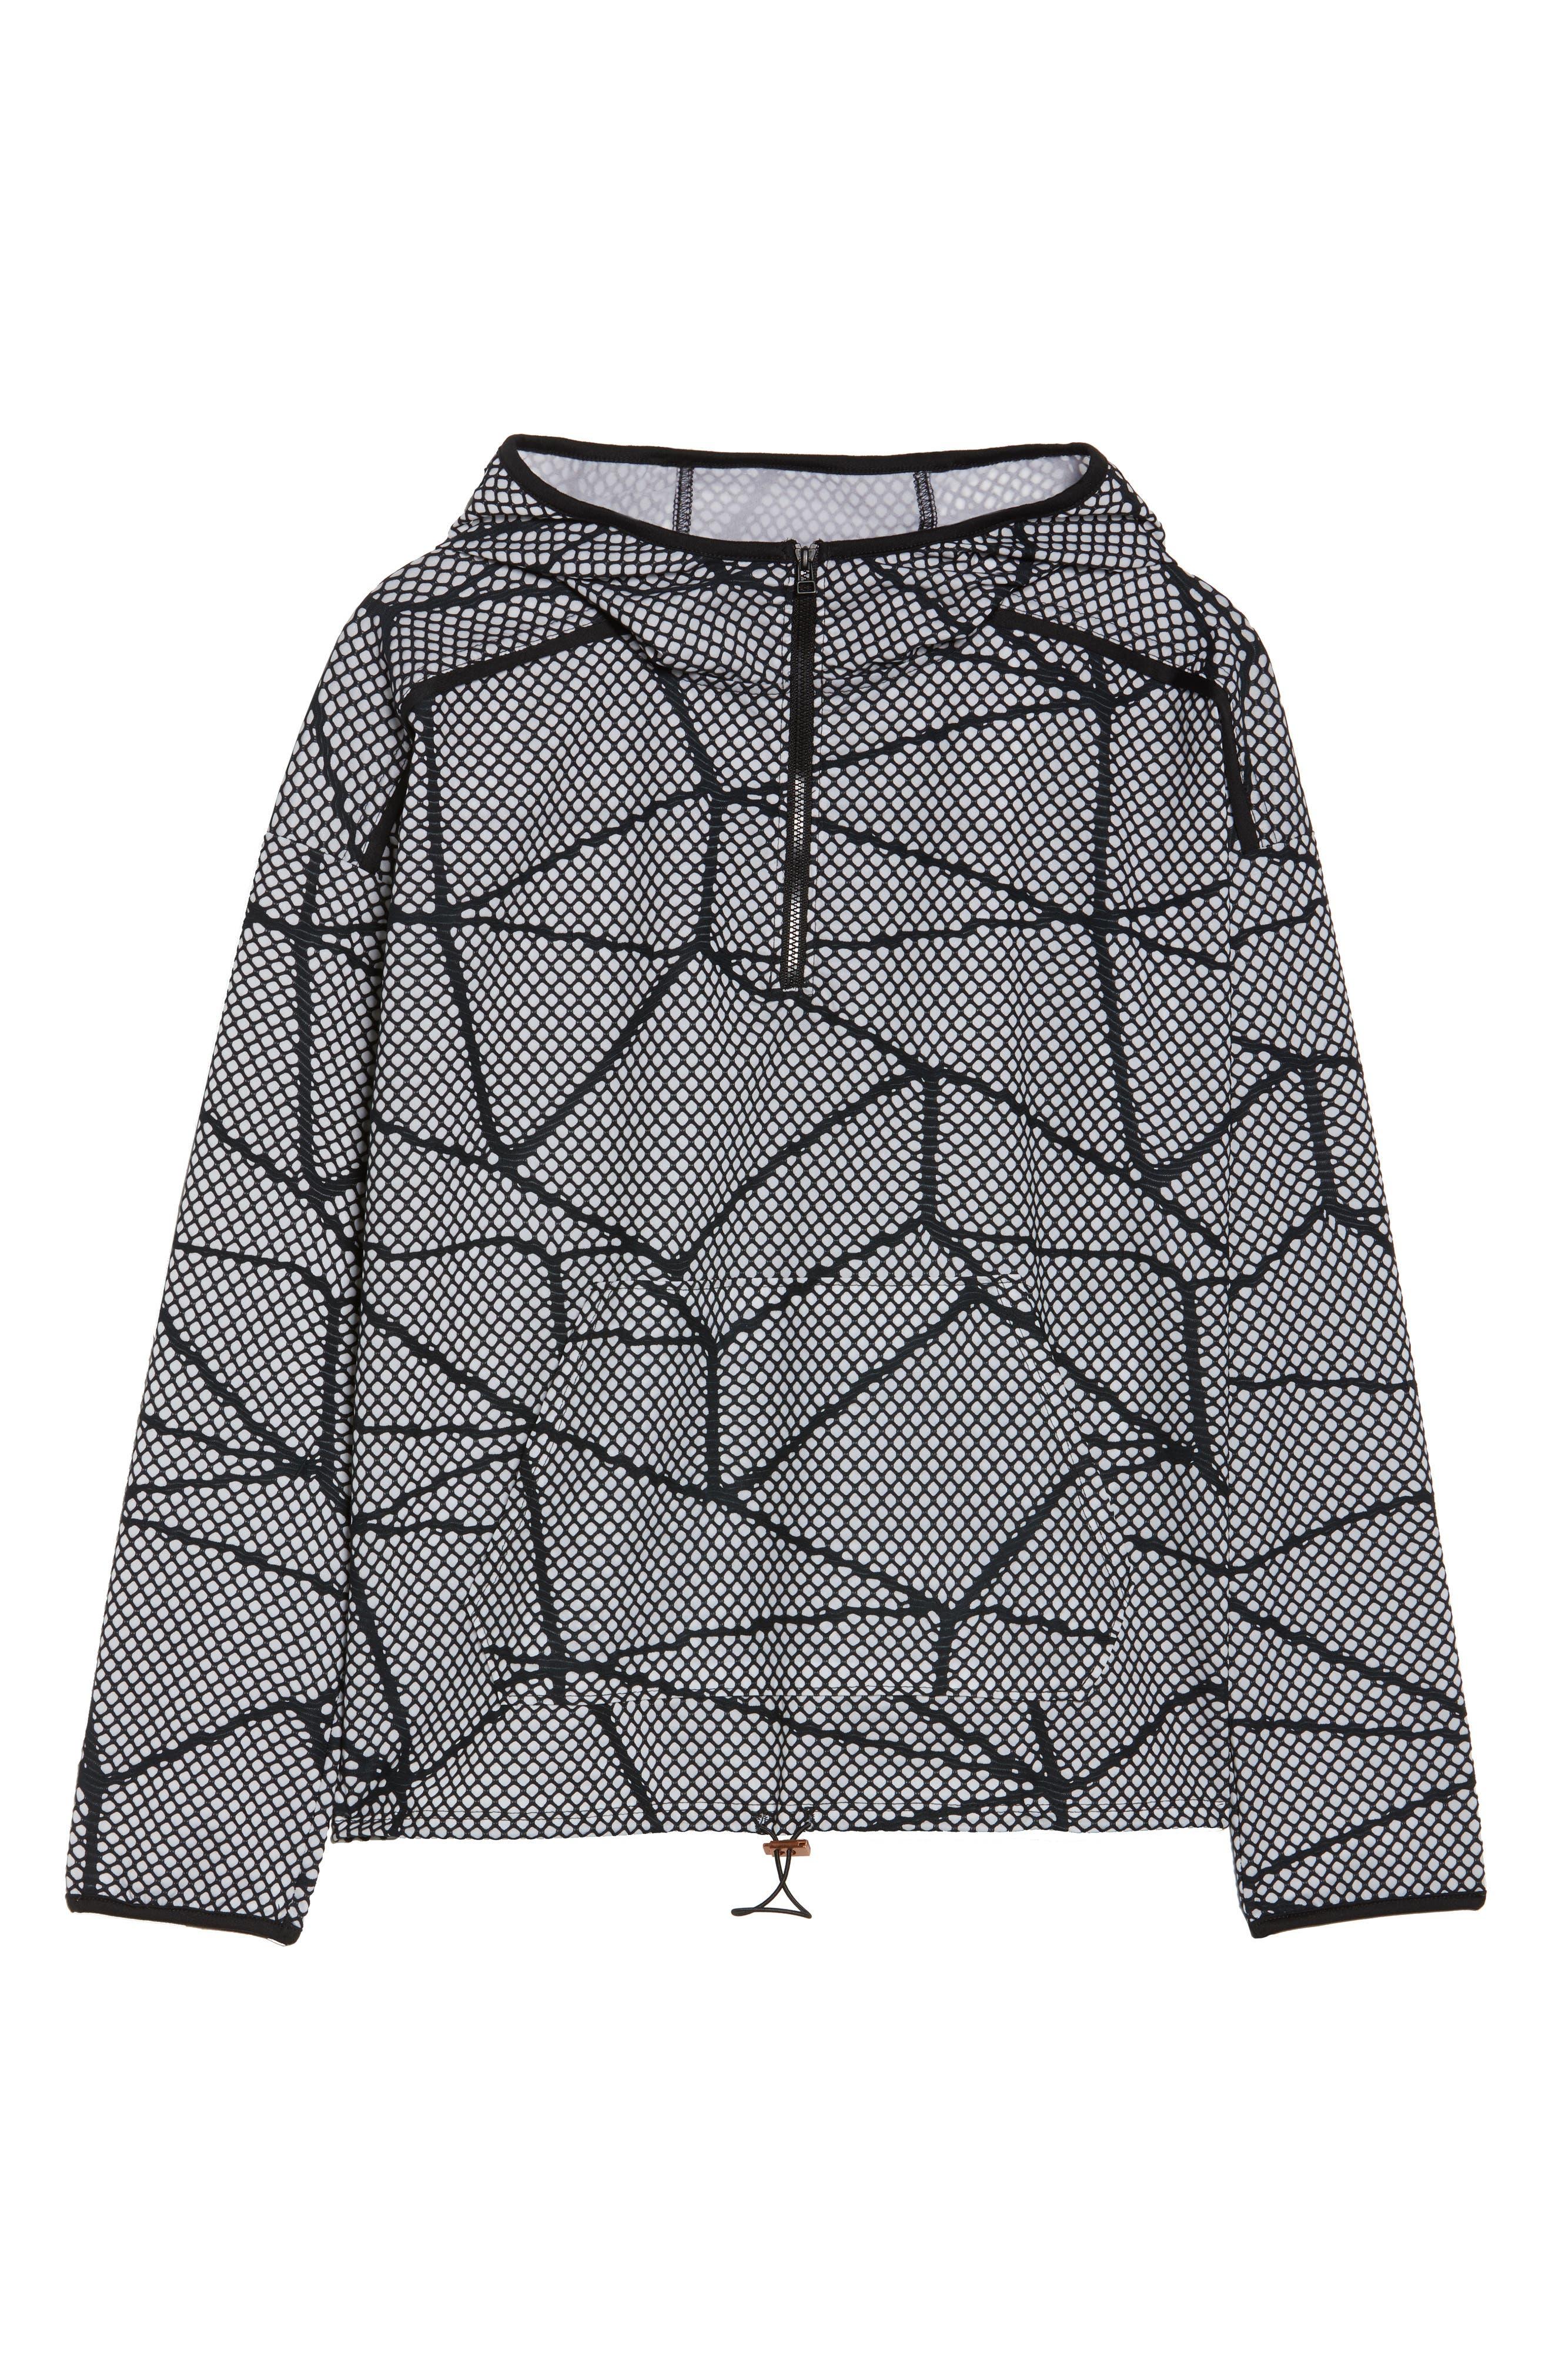 Chromatic Hoodie Pullover,                             Alternate thumbnail 7, color,                             Black-White Chromatic